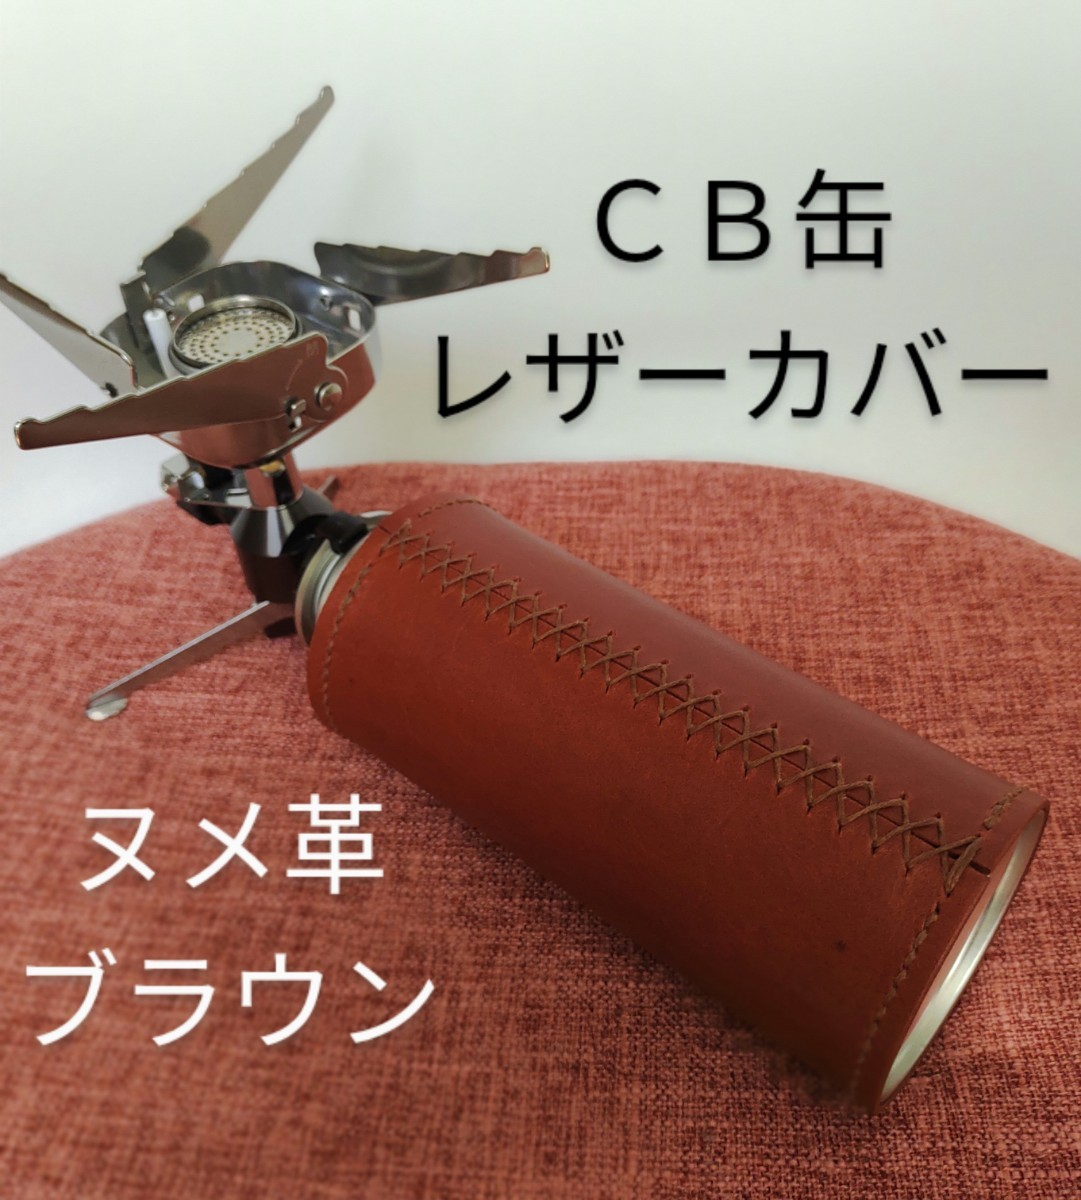 CB缶カバー(ガス缶カバー) ヌメ革  オイルレザー ココアブラウン